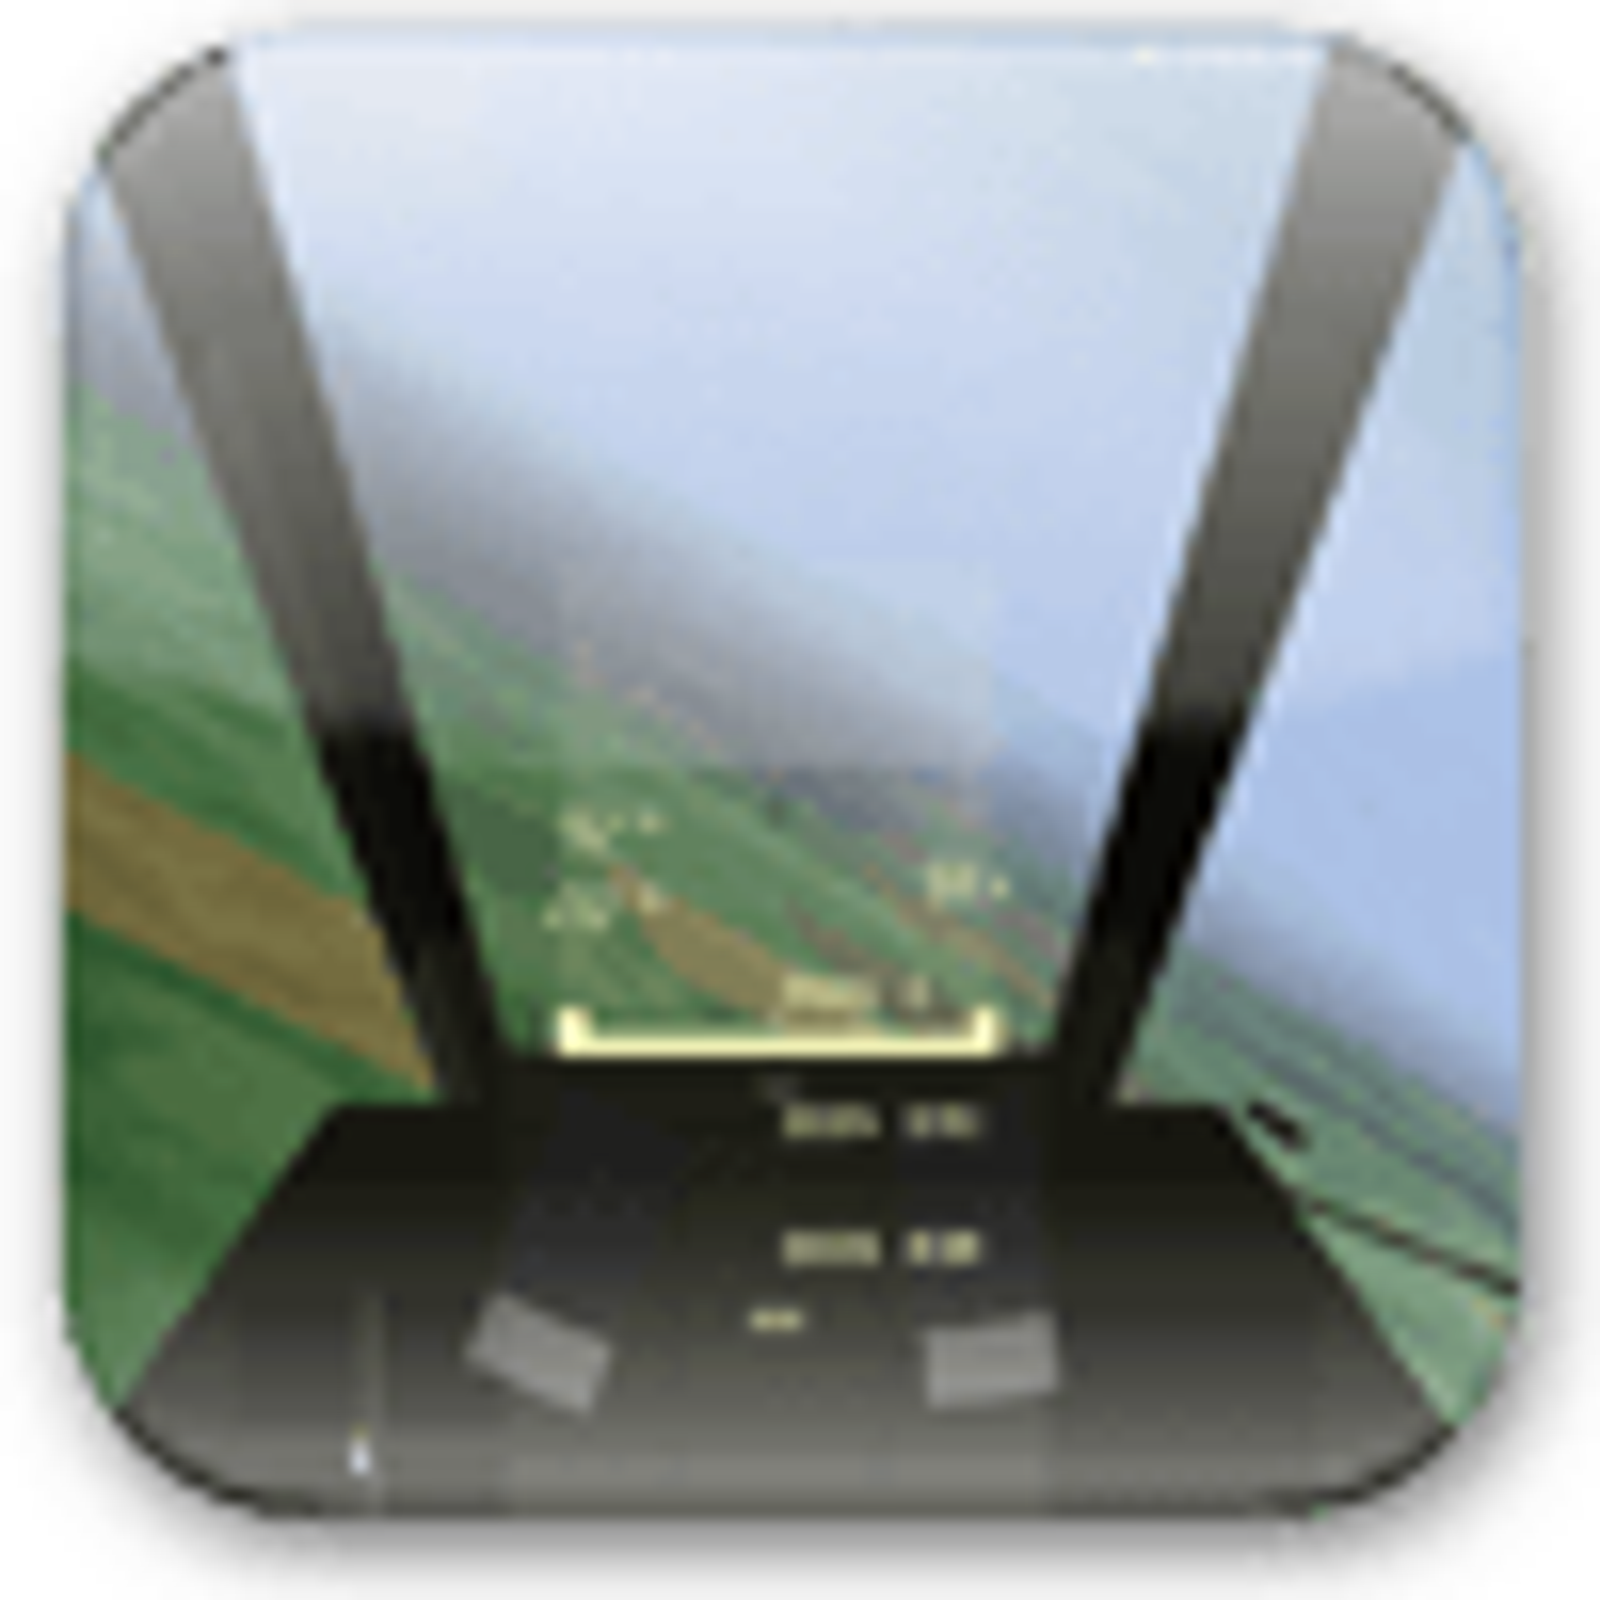 Fictional Air Combat